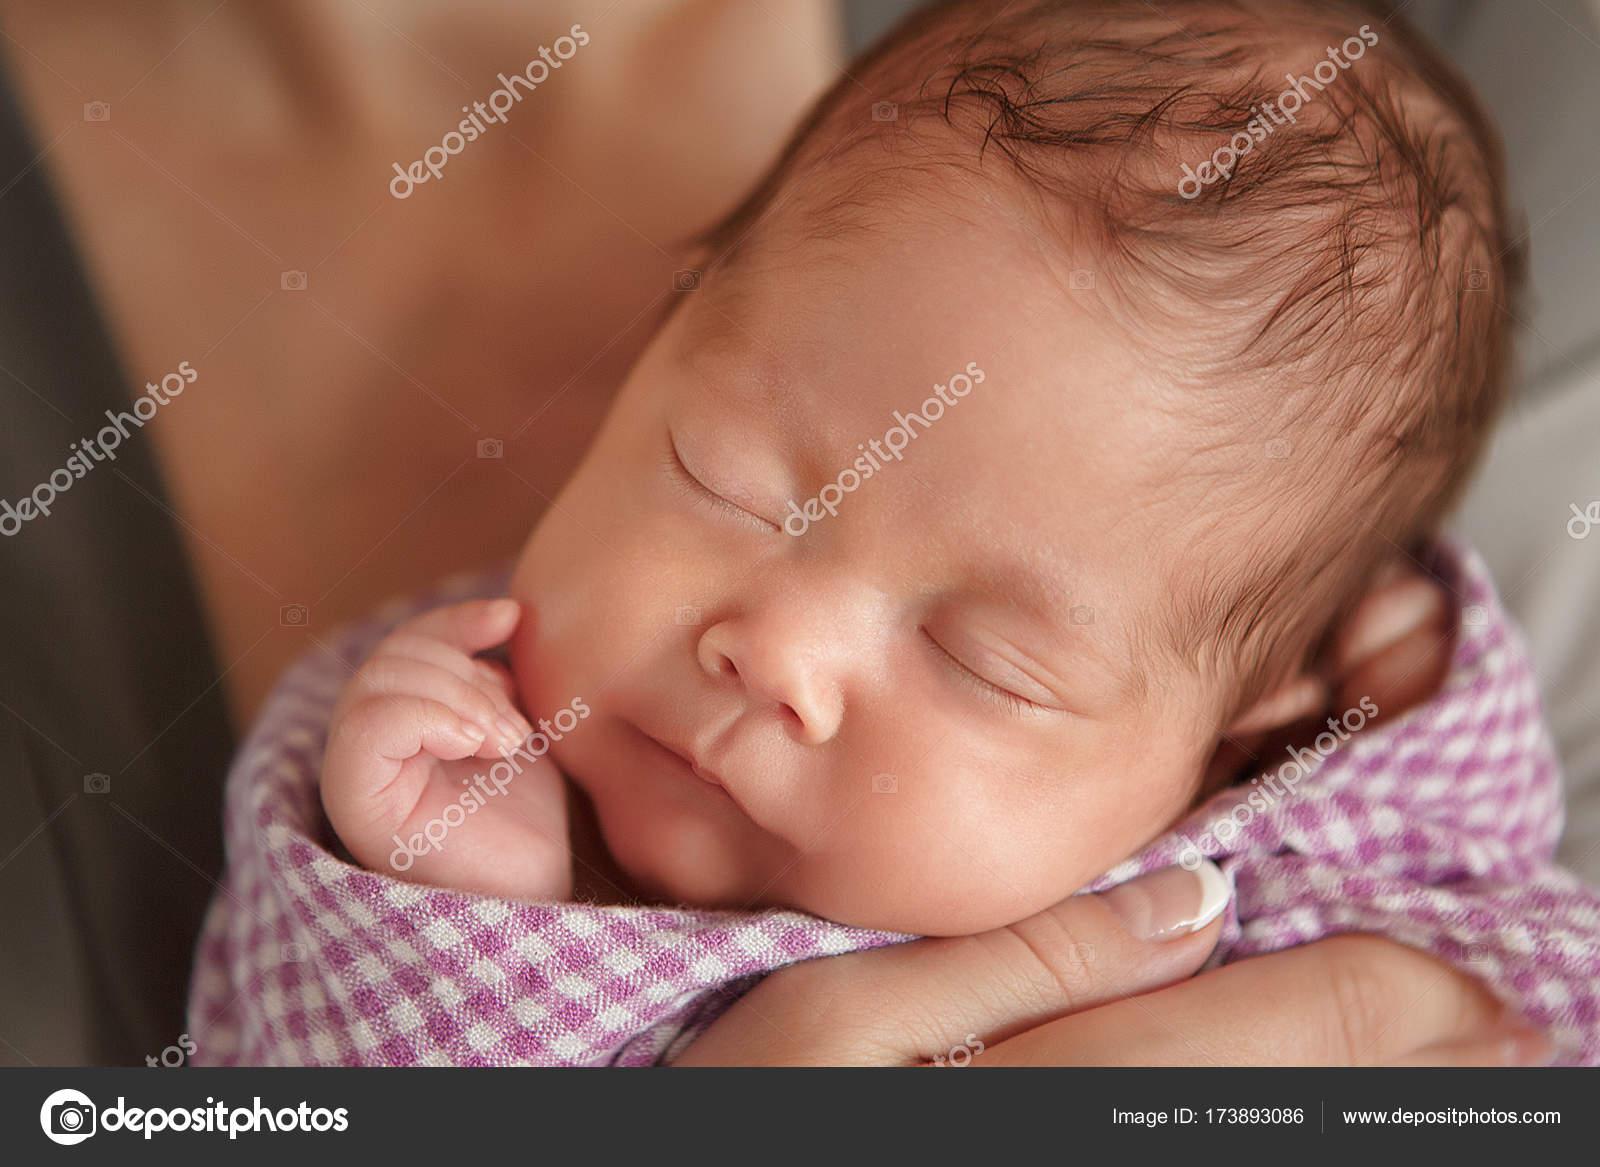 fe7155a9b Newborn baby tender sleeping on wool couturier blanket. Pure human ...